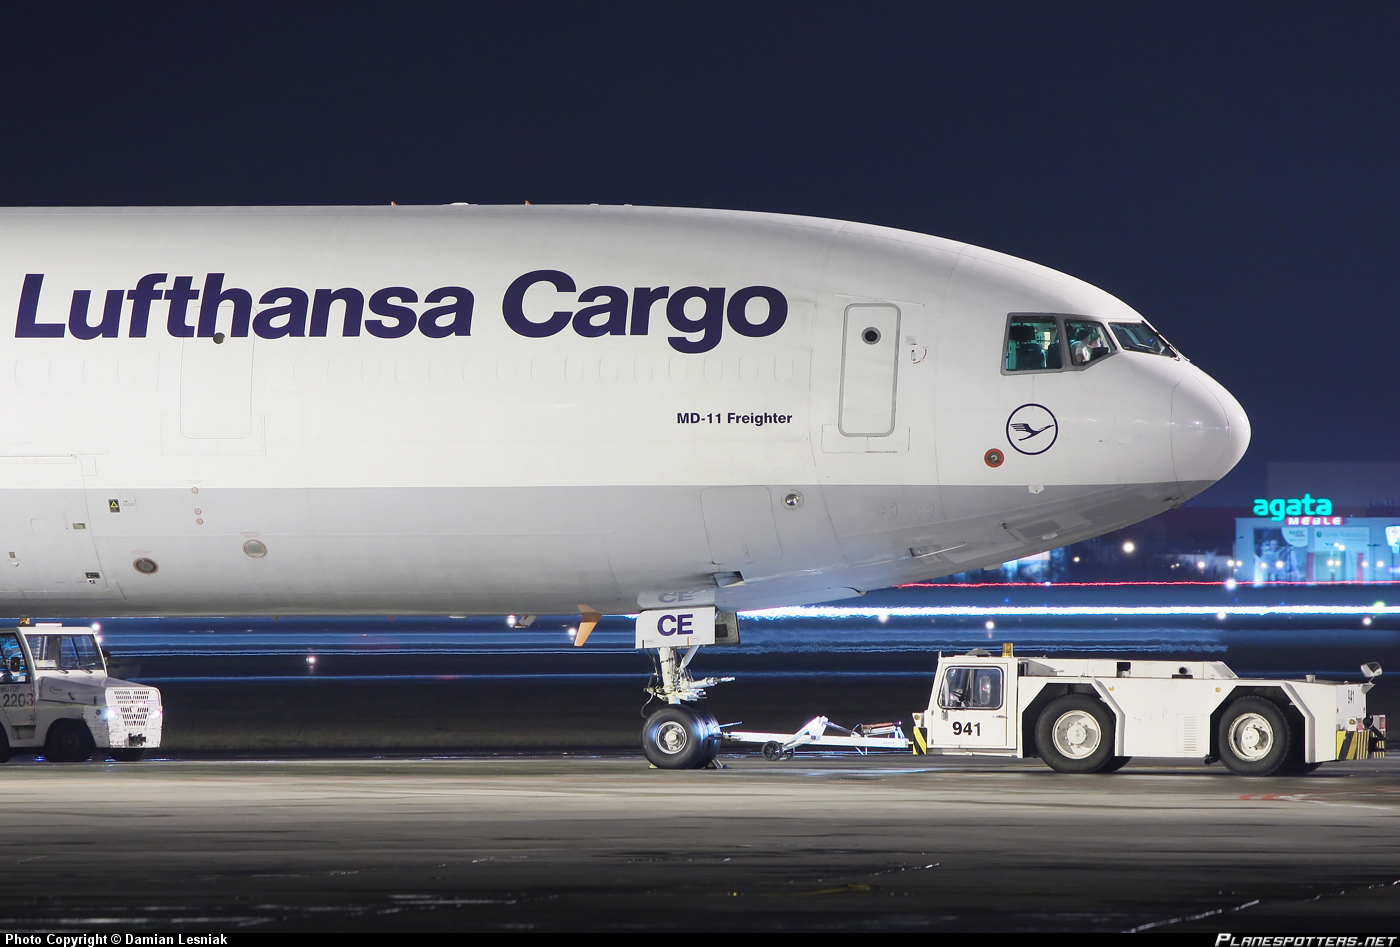 Lufthansa 2003 dinamizacion del cambio